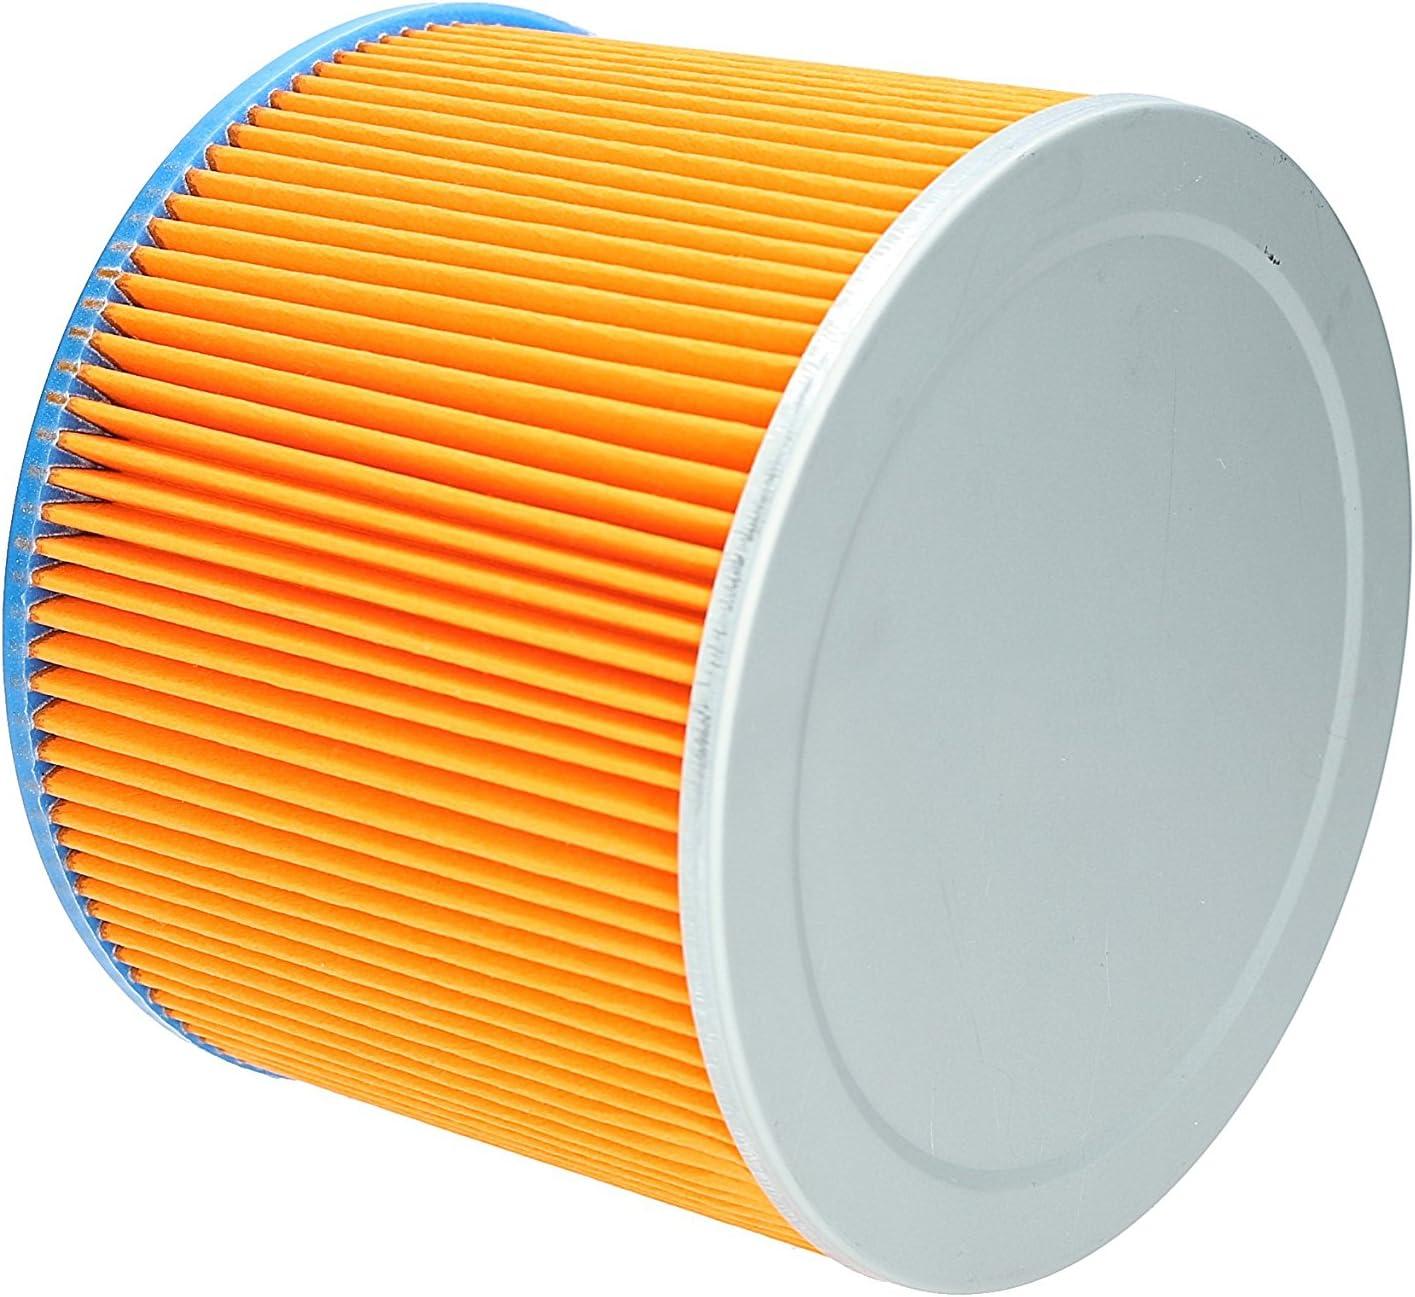 Para uso seco Wessper Filtro de cartucho para aspirador CELMA POW 0345 1250W